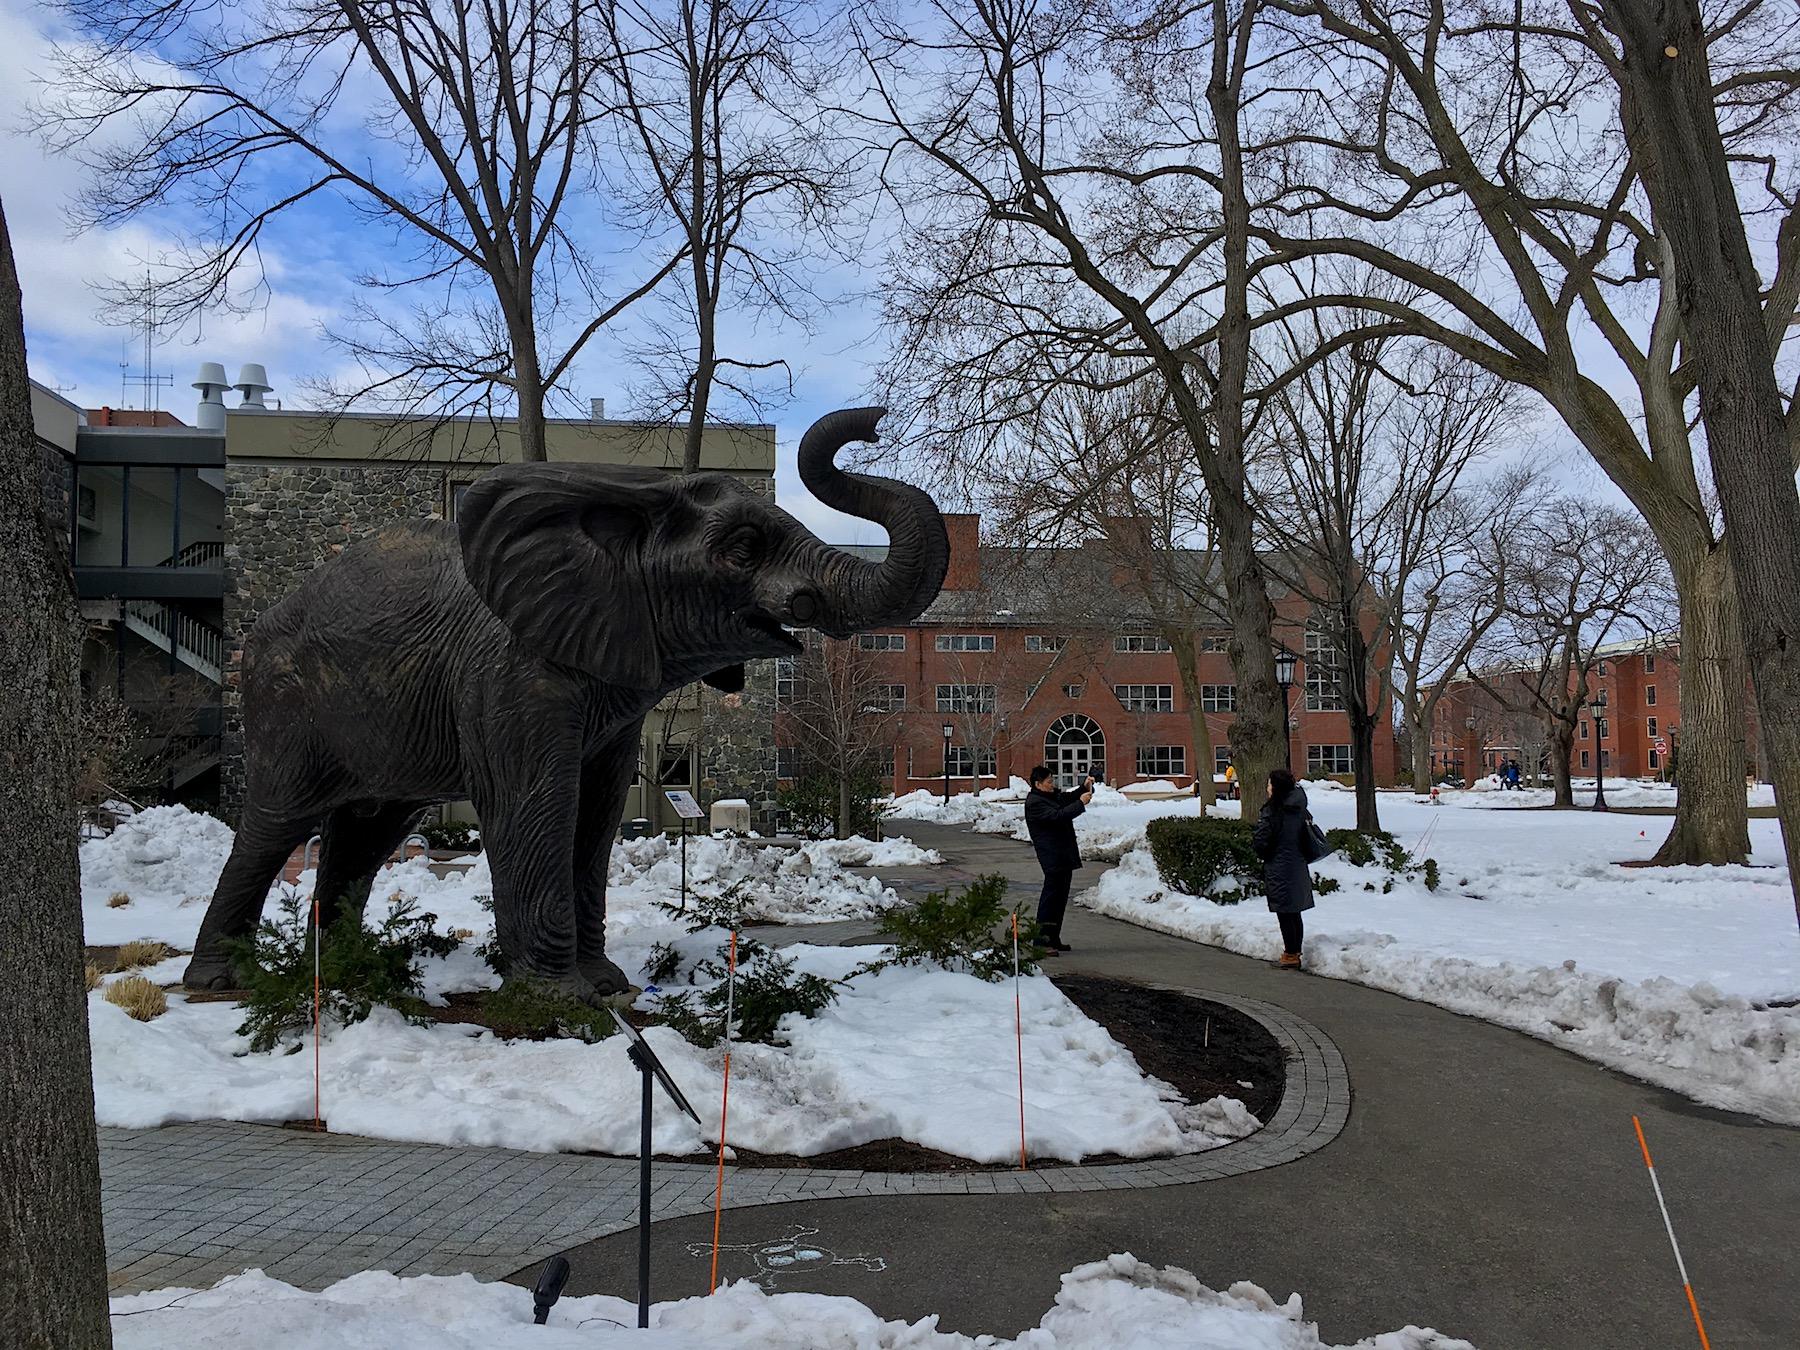 Tufts-Mascot.jpg